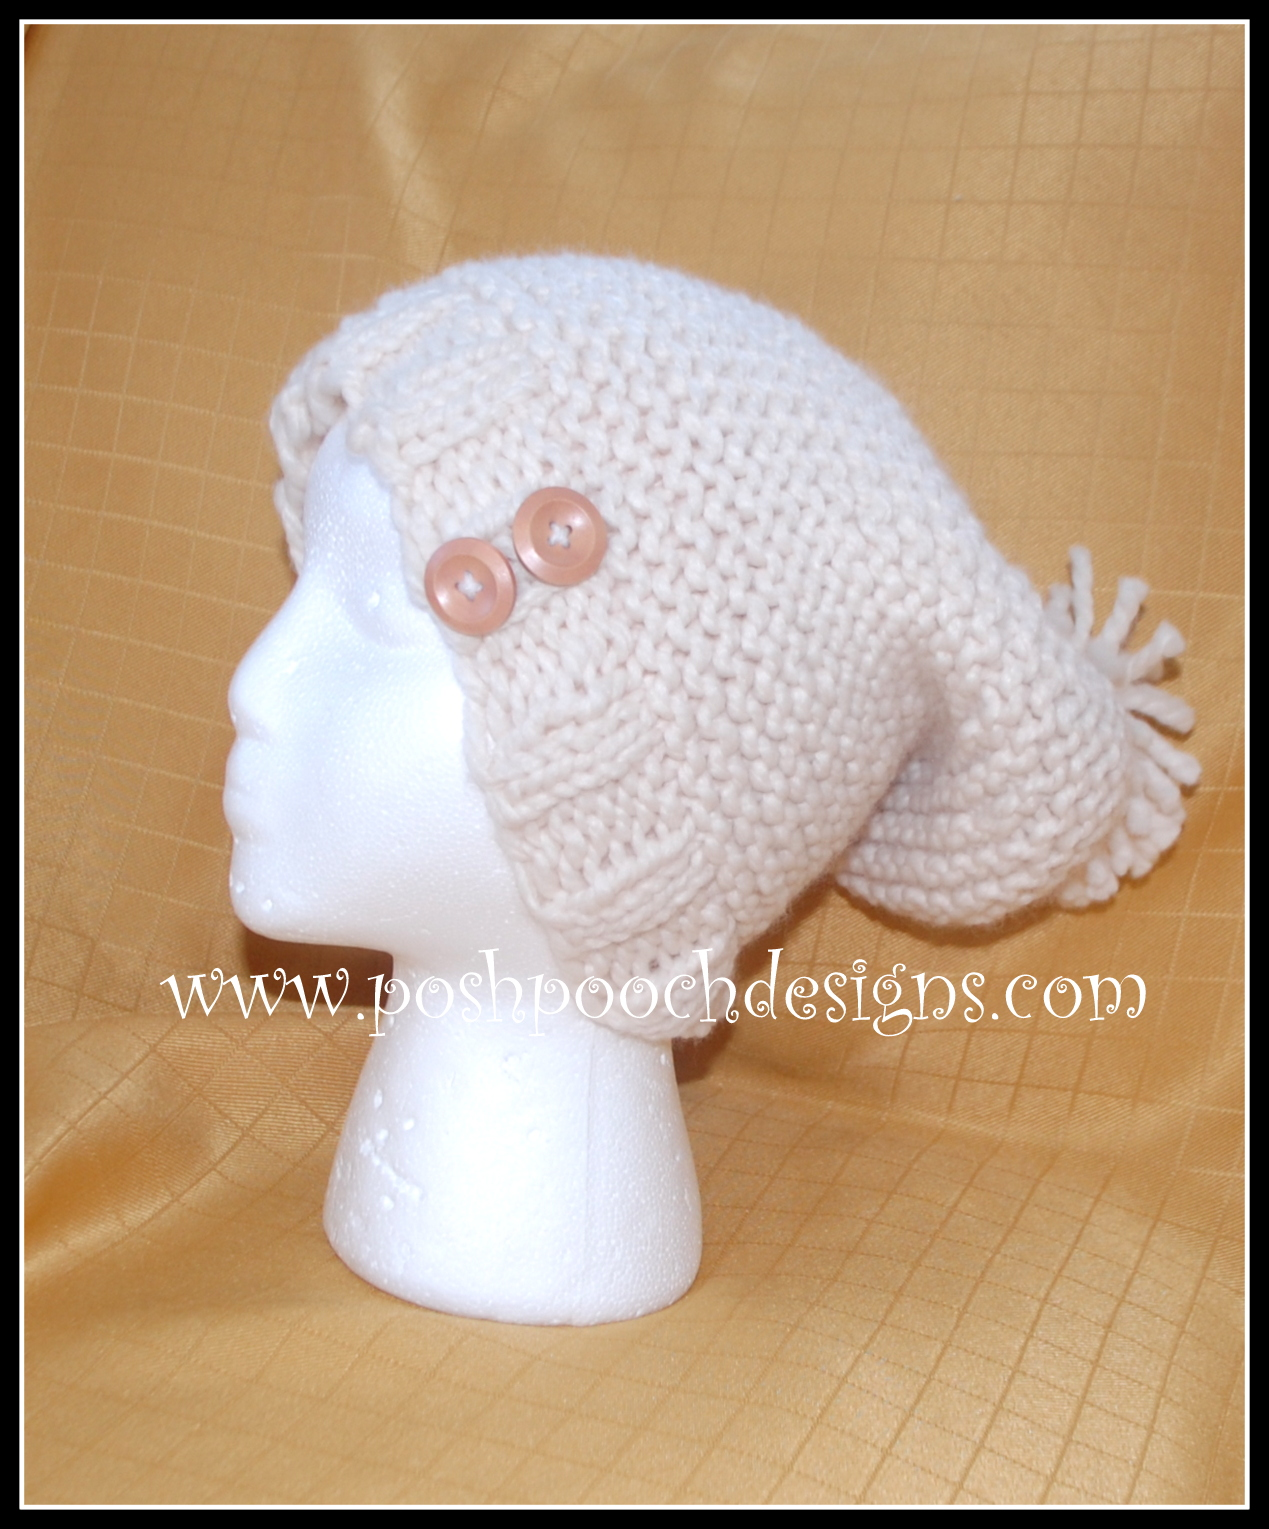 Posh Pooch Designs Dog Clothes: Aran Chunky Slouchy Hat Free